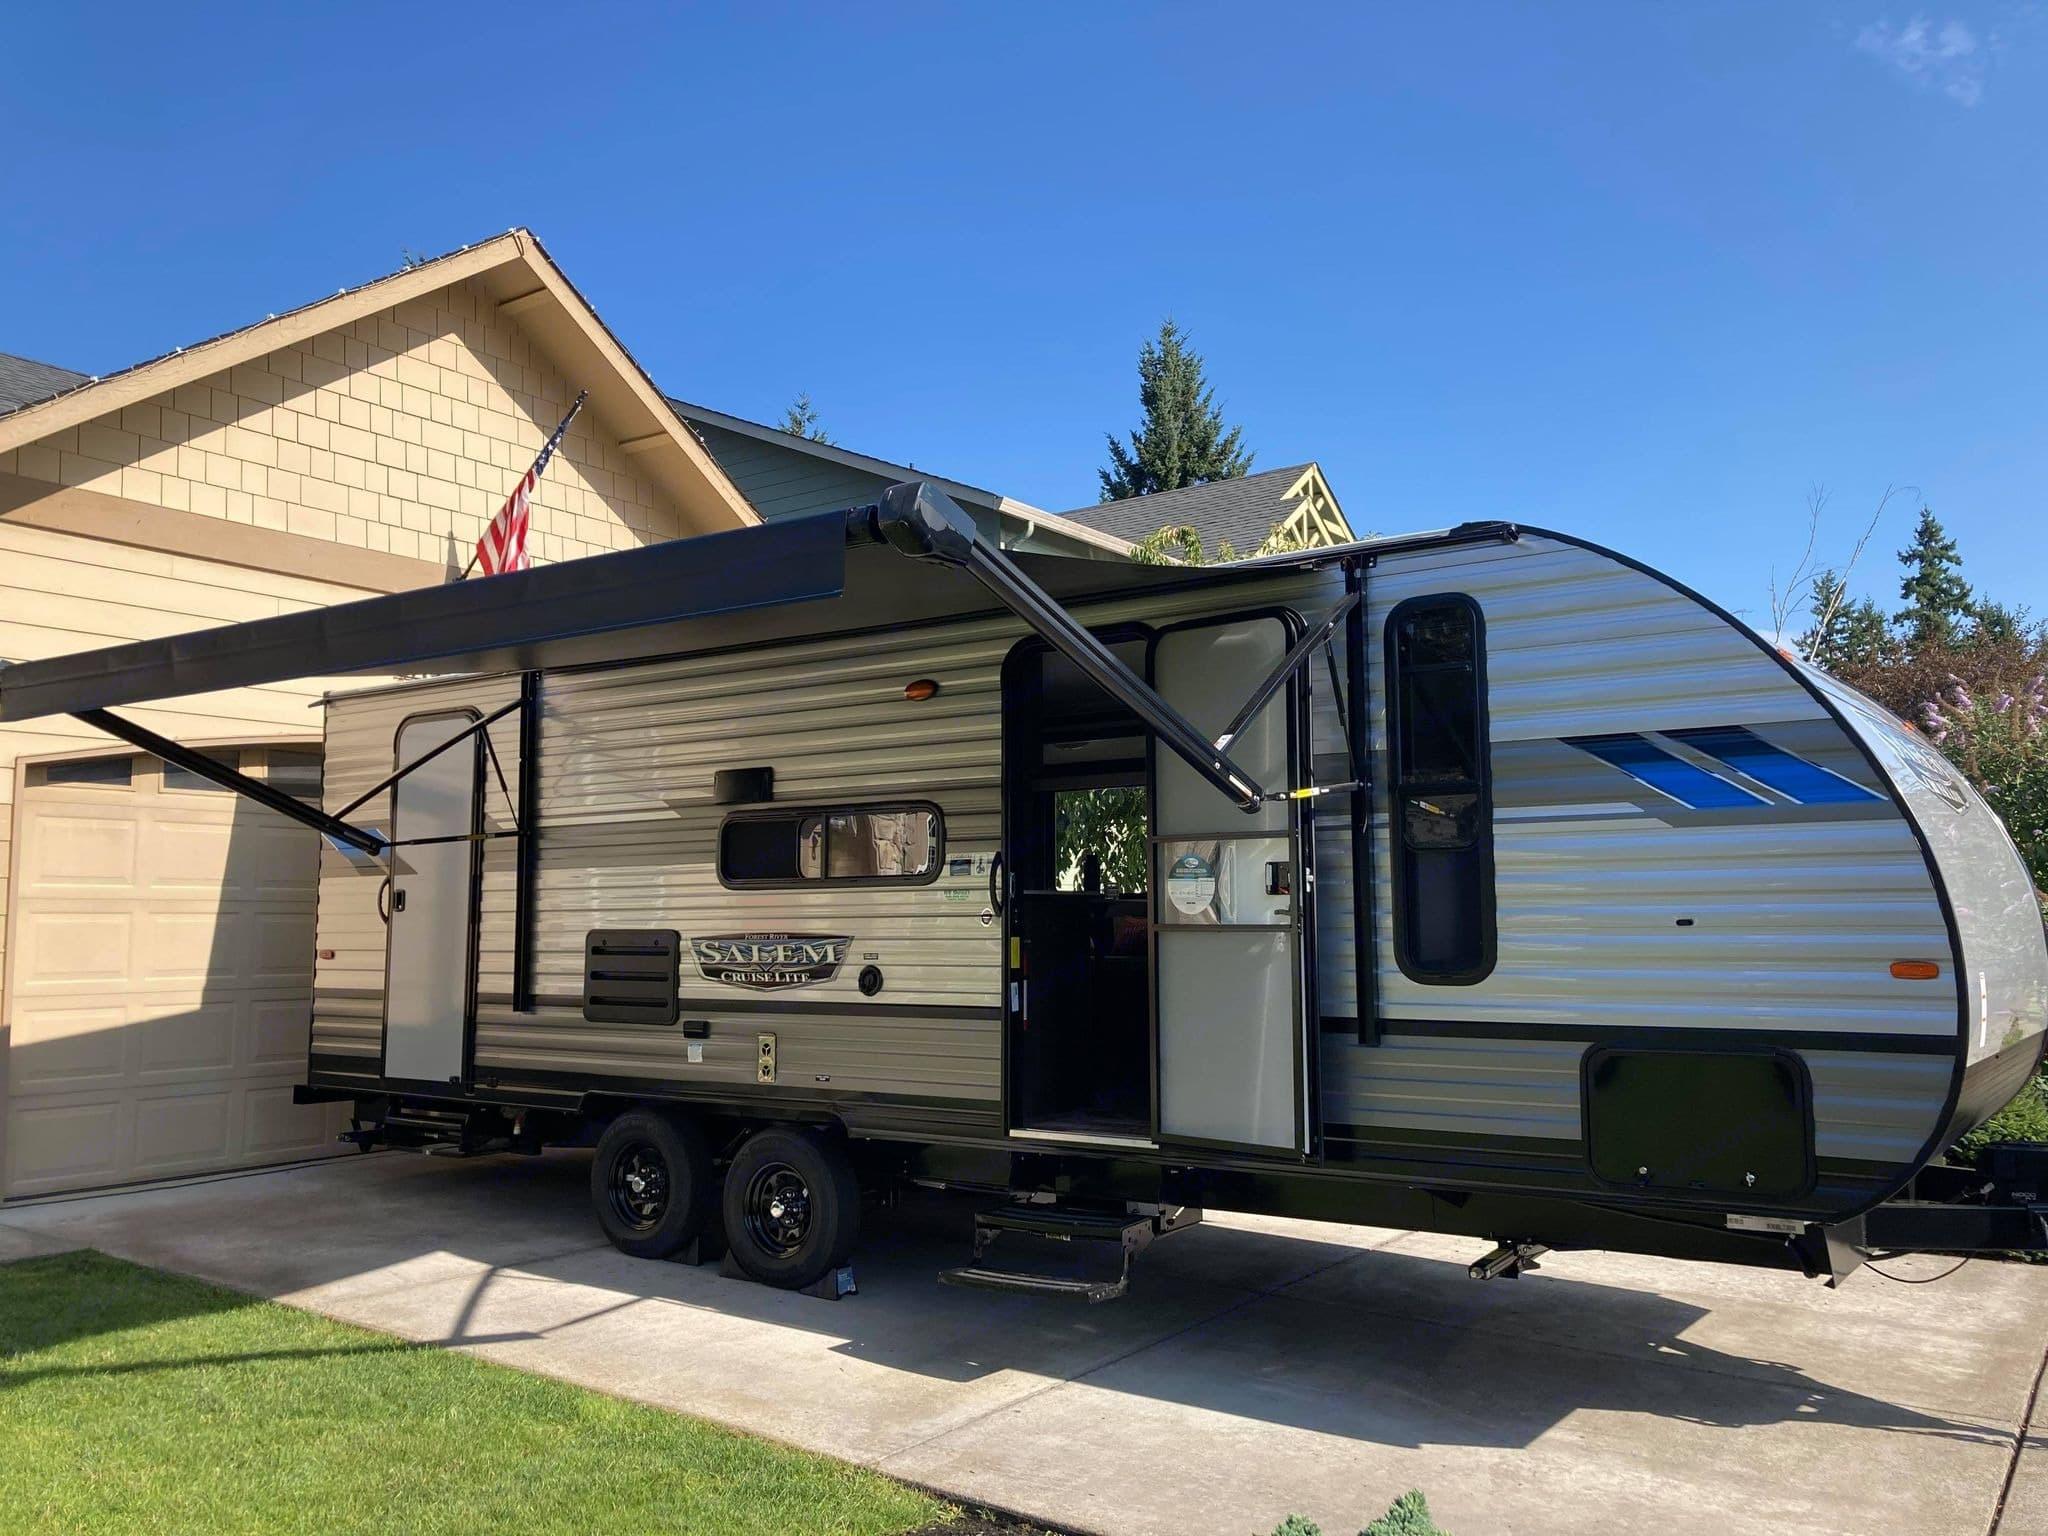 Brand New Forest River Salem model 24 ft (27 ft with hitch) travel trailer.. Forest River Salem Cruise Lite 2021